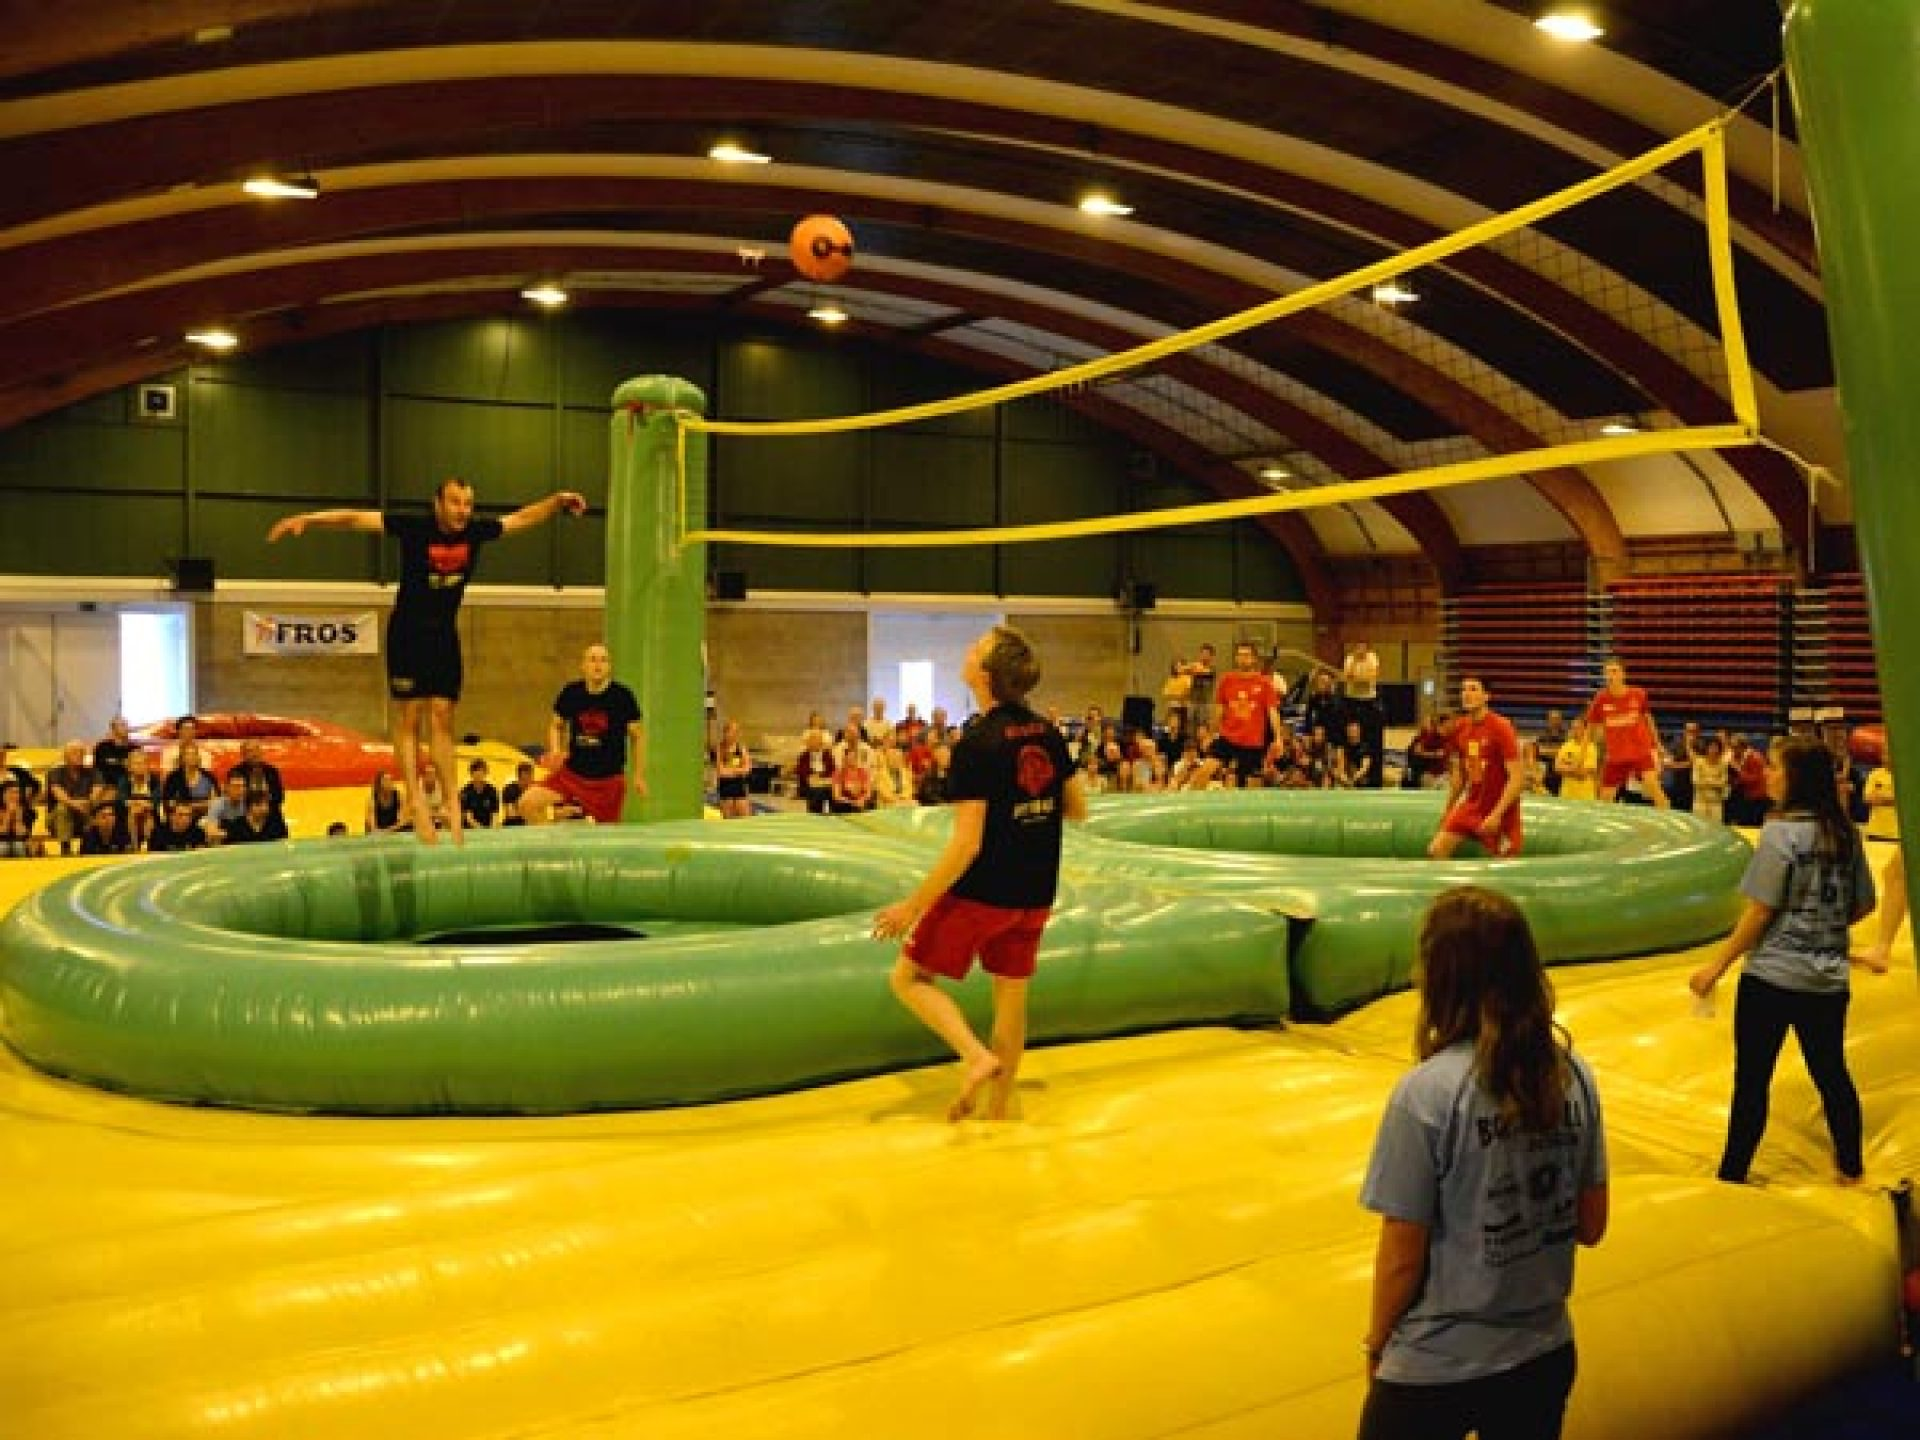 Bossaball emerges as a new indoor sport 1920x1440